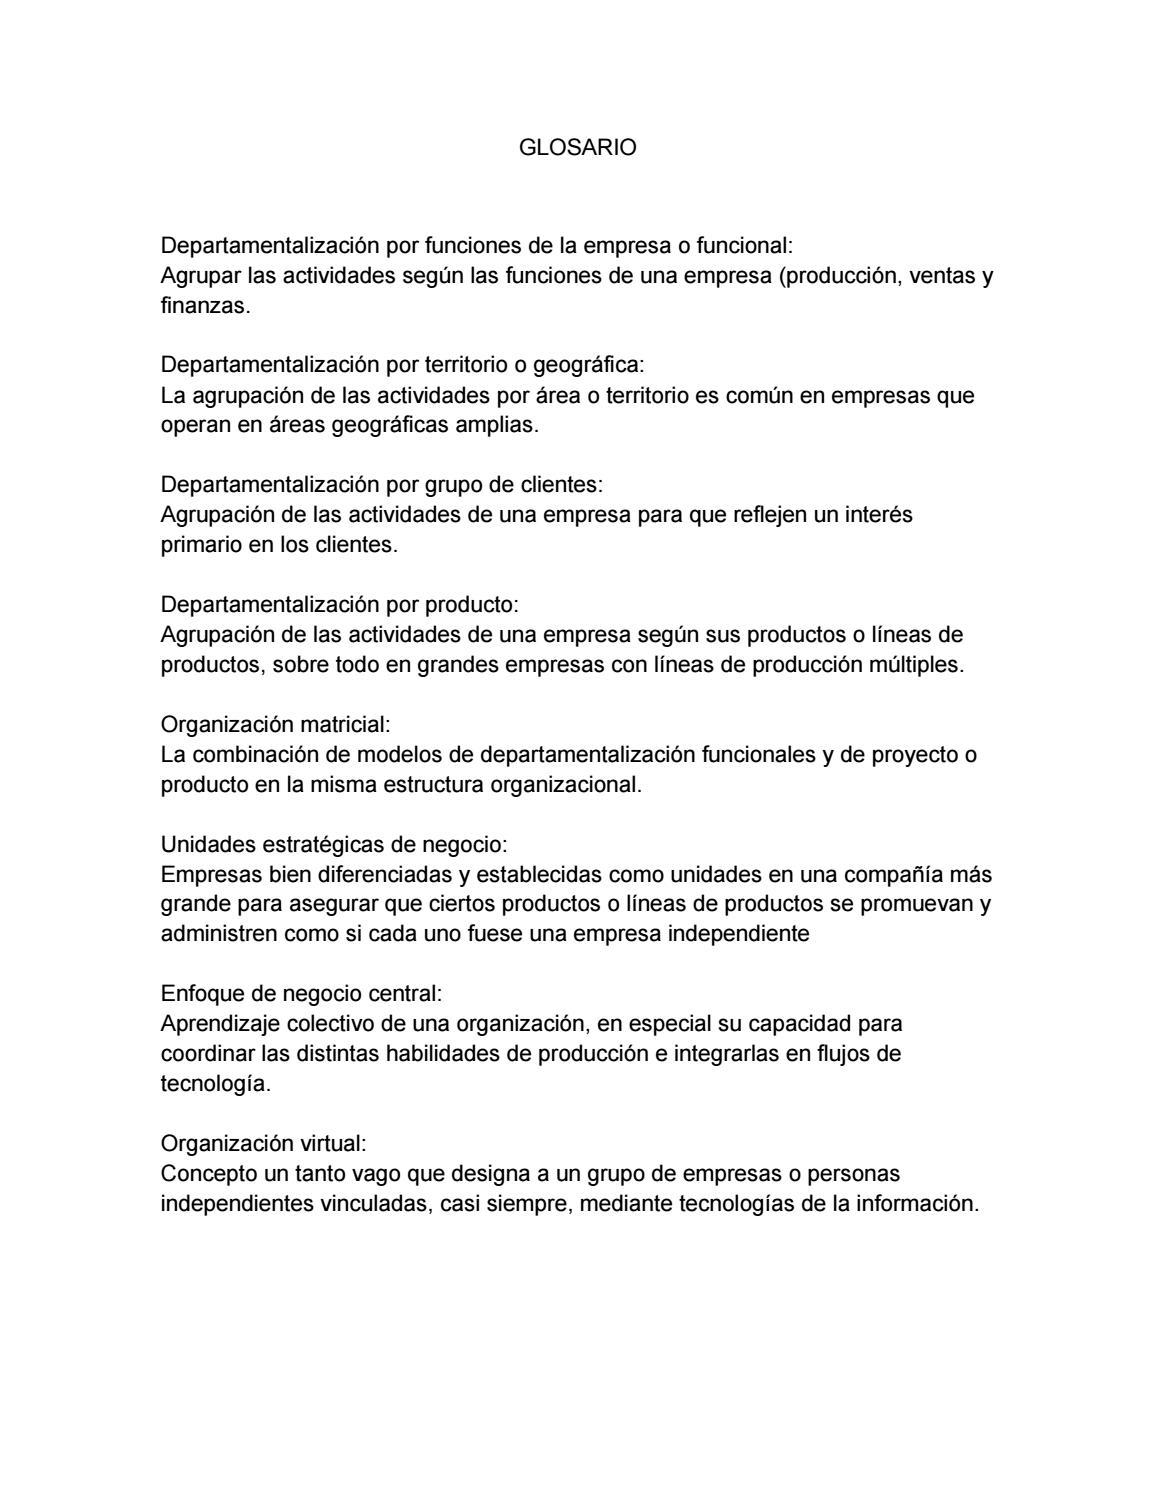 Glosario By Charcuteria La Pradera Issuu